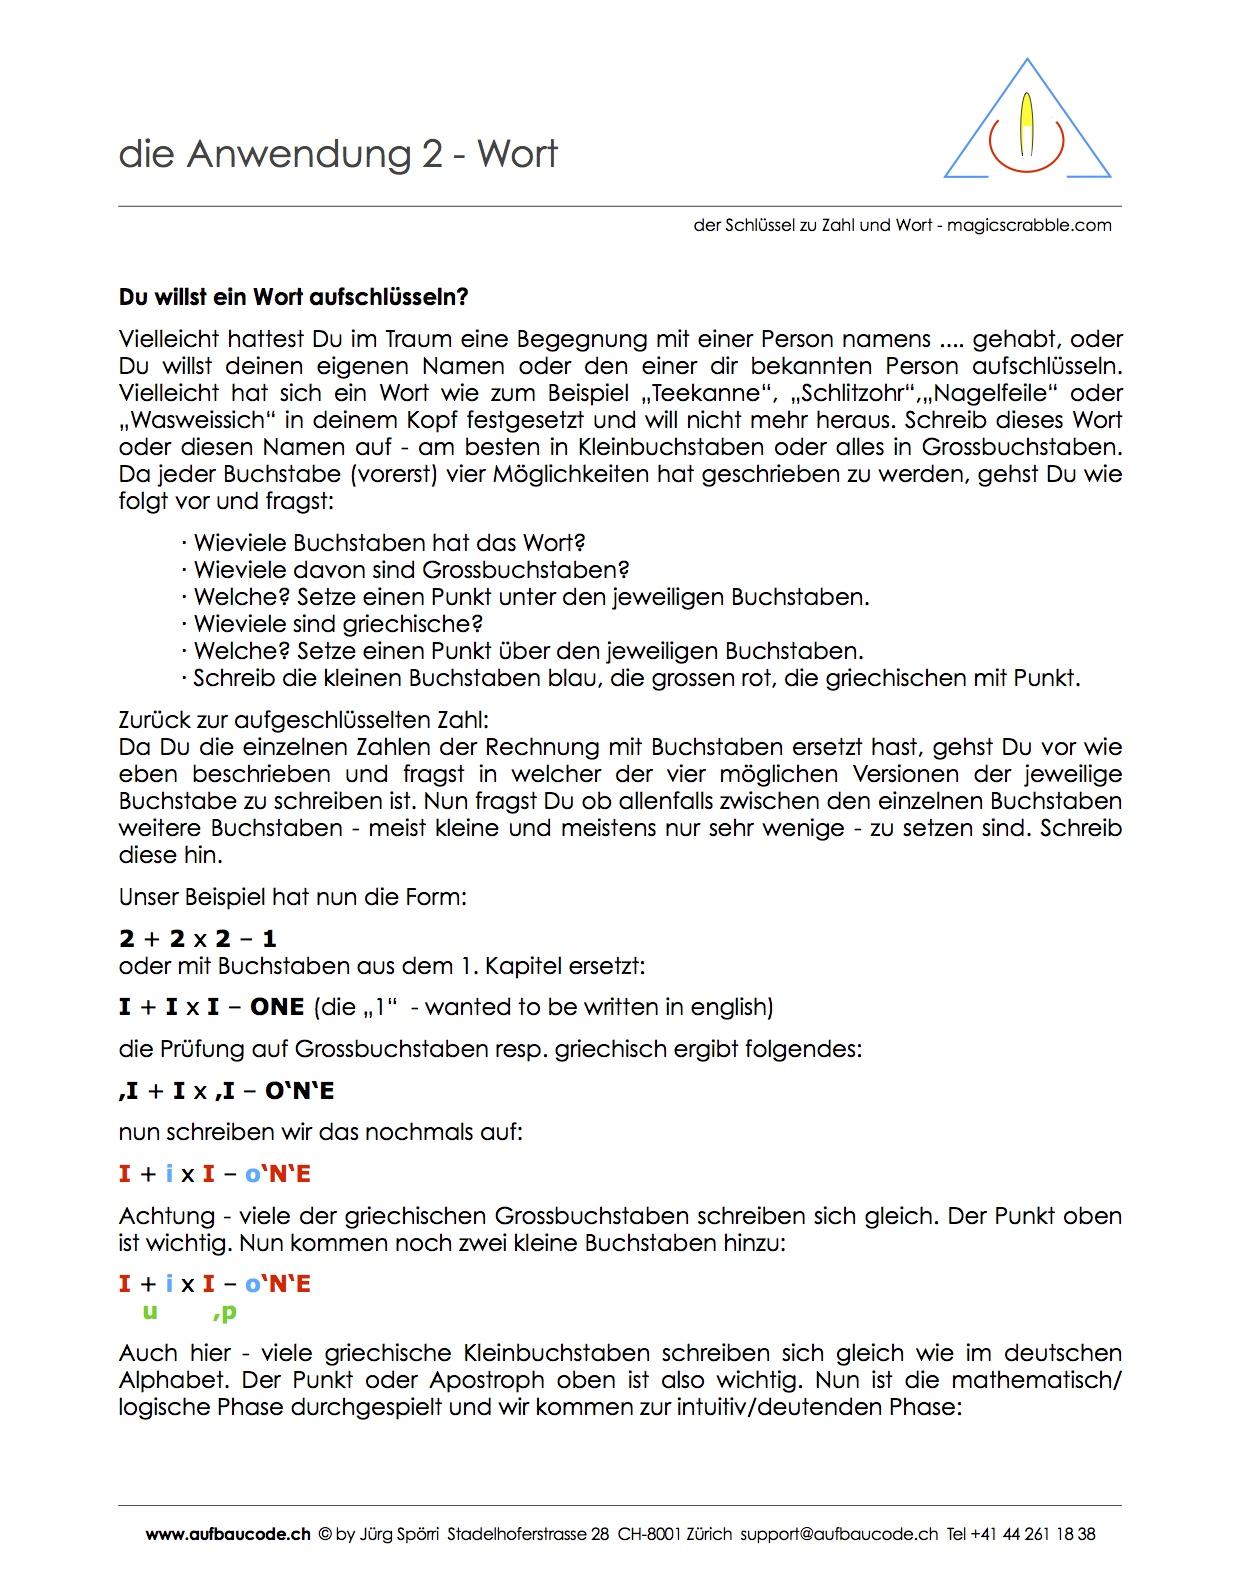 Aufbaucode - Anwendung 2 - Wort